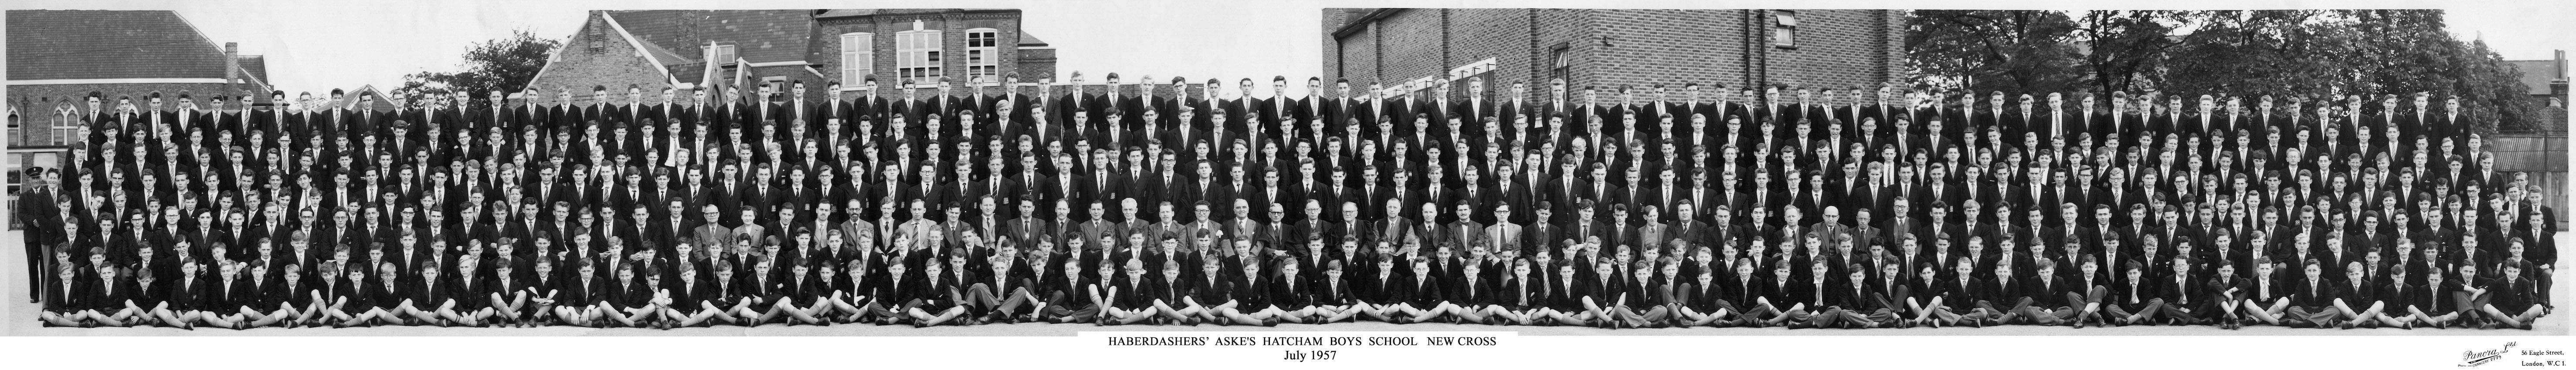 1957 Panorama